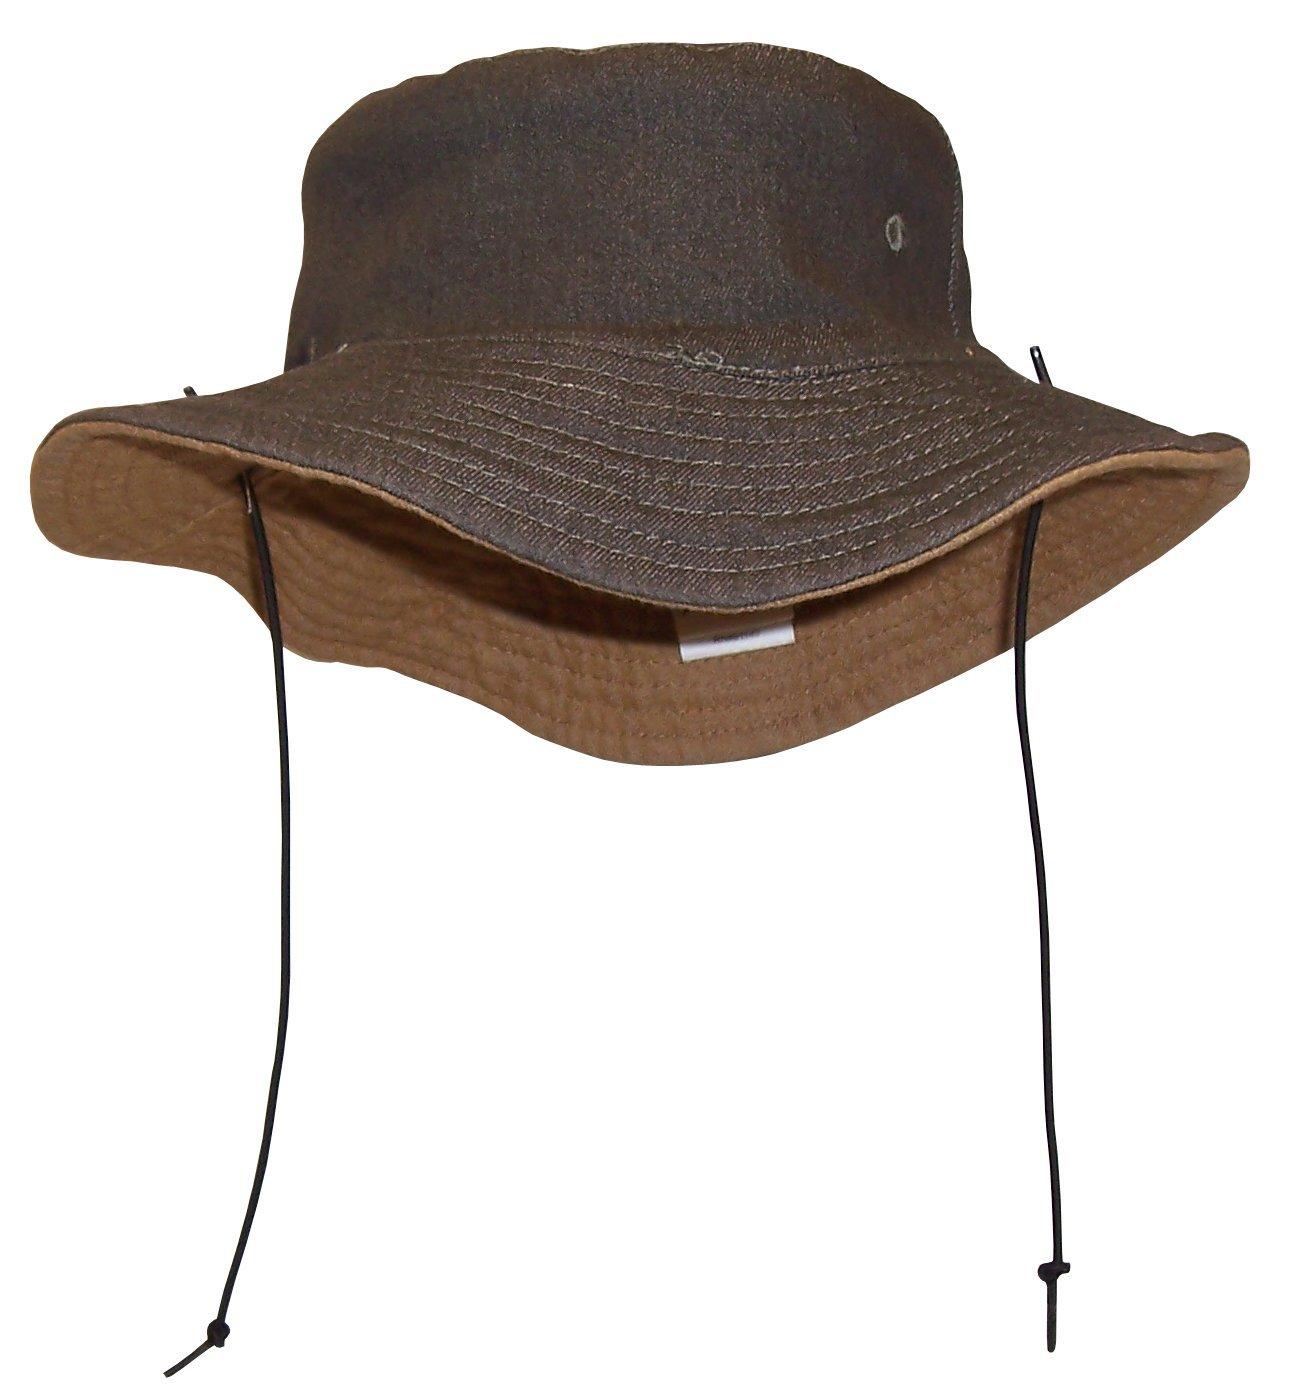 N'Ice Caps Kids Distressed Denim Reversible Adjustable Sun Protection Hat 402-D-52-OT